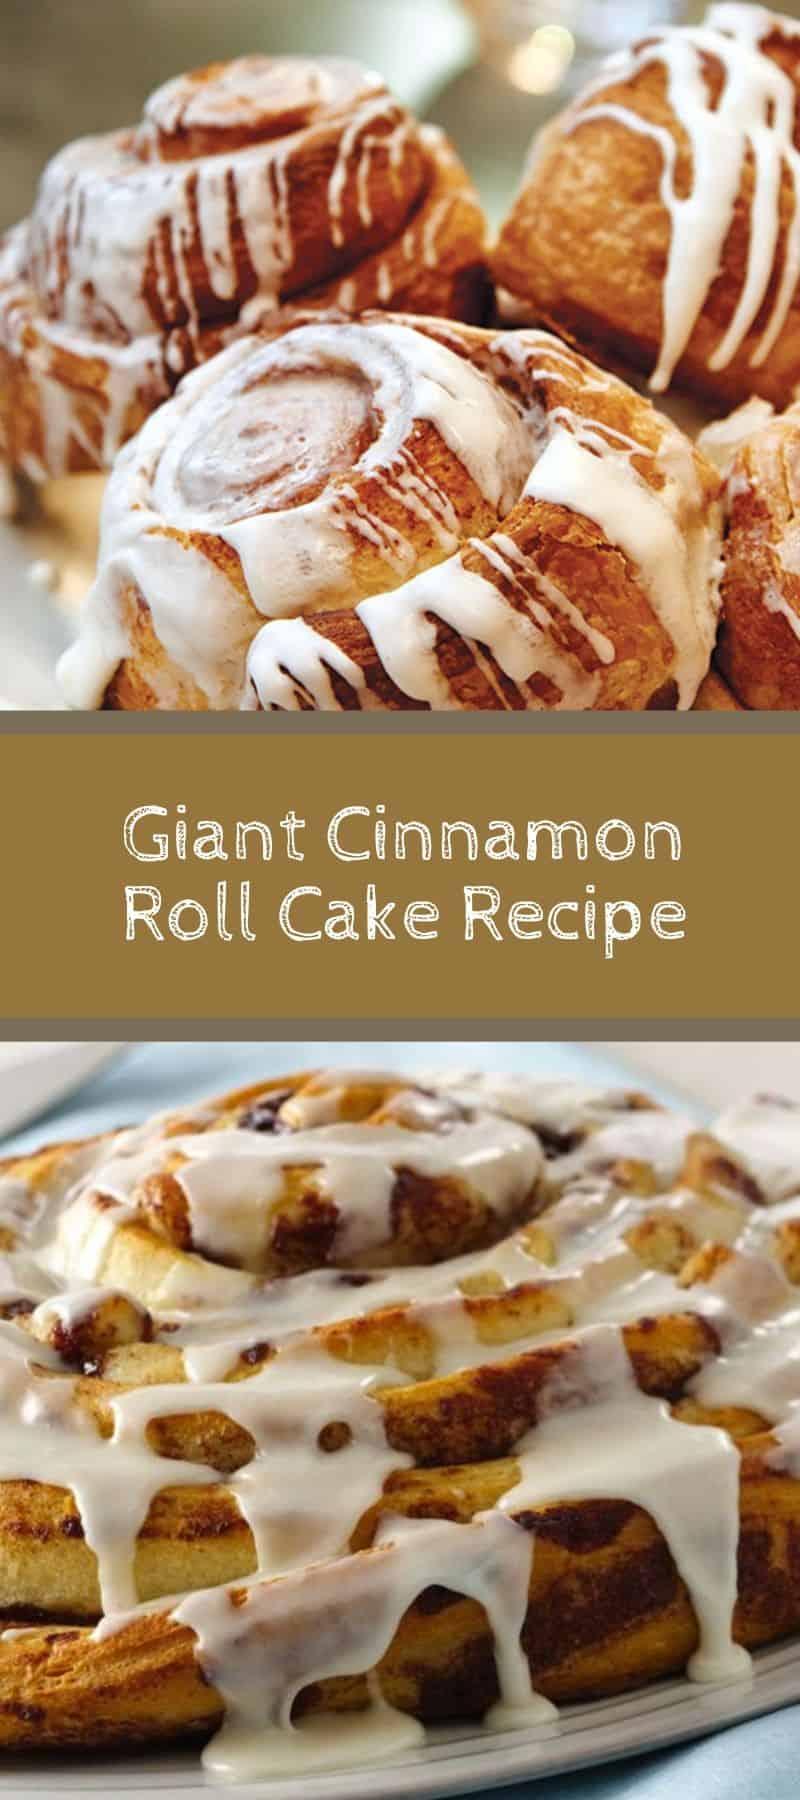 Giant Cinnamon Roll Cake Recipe 2